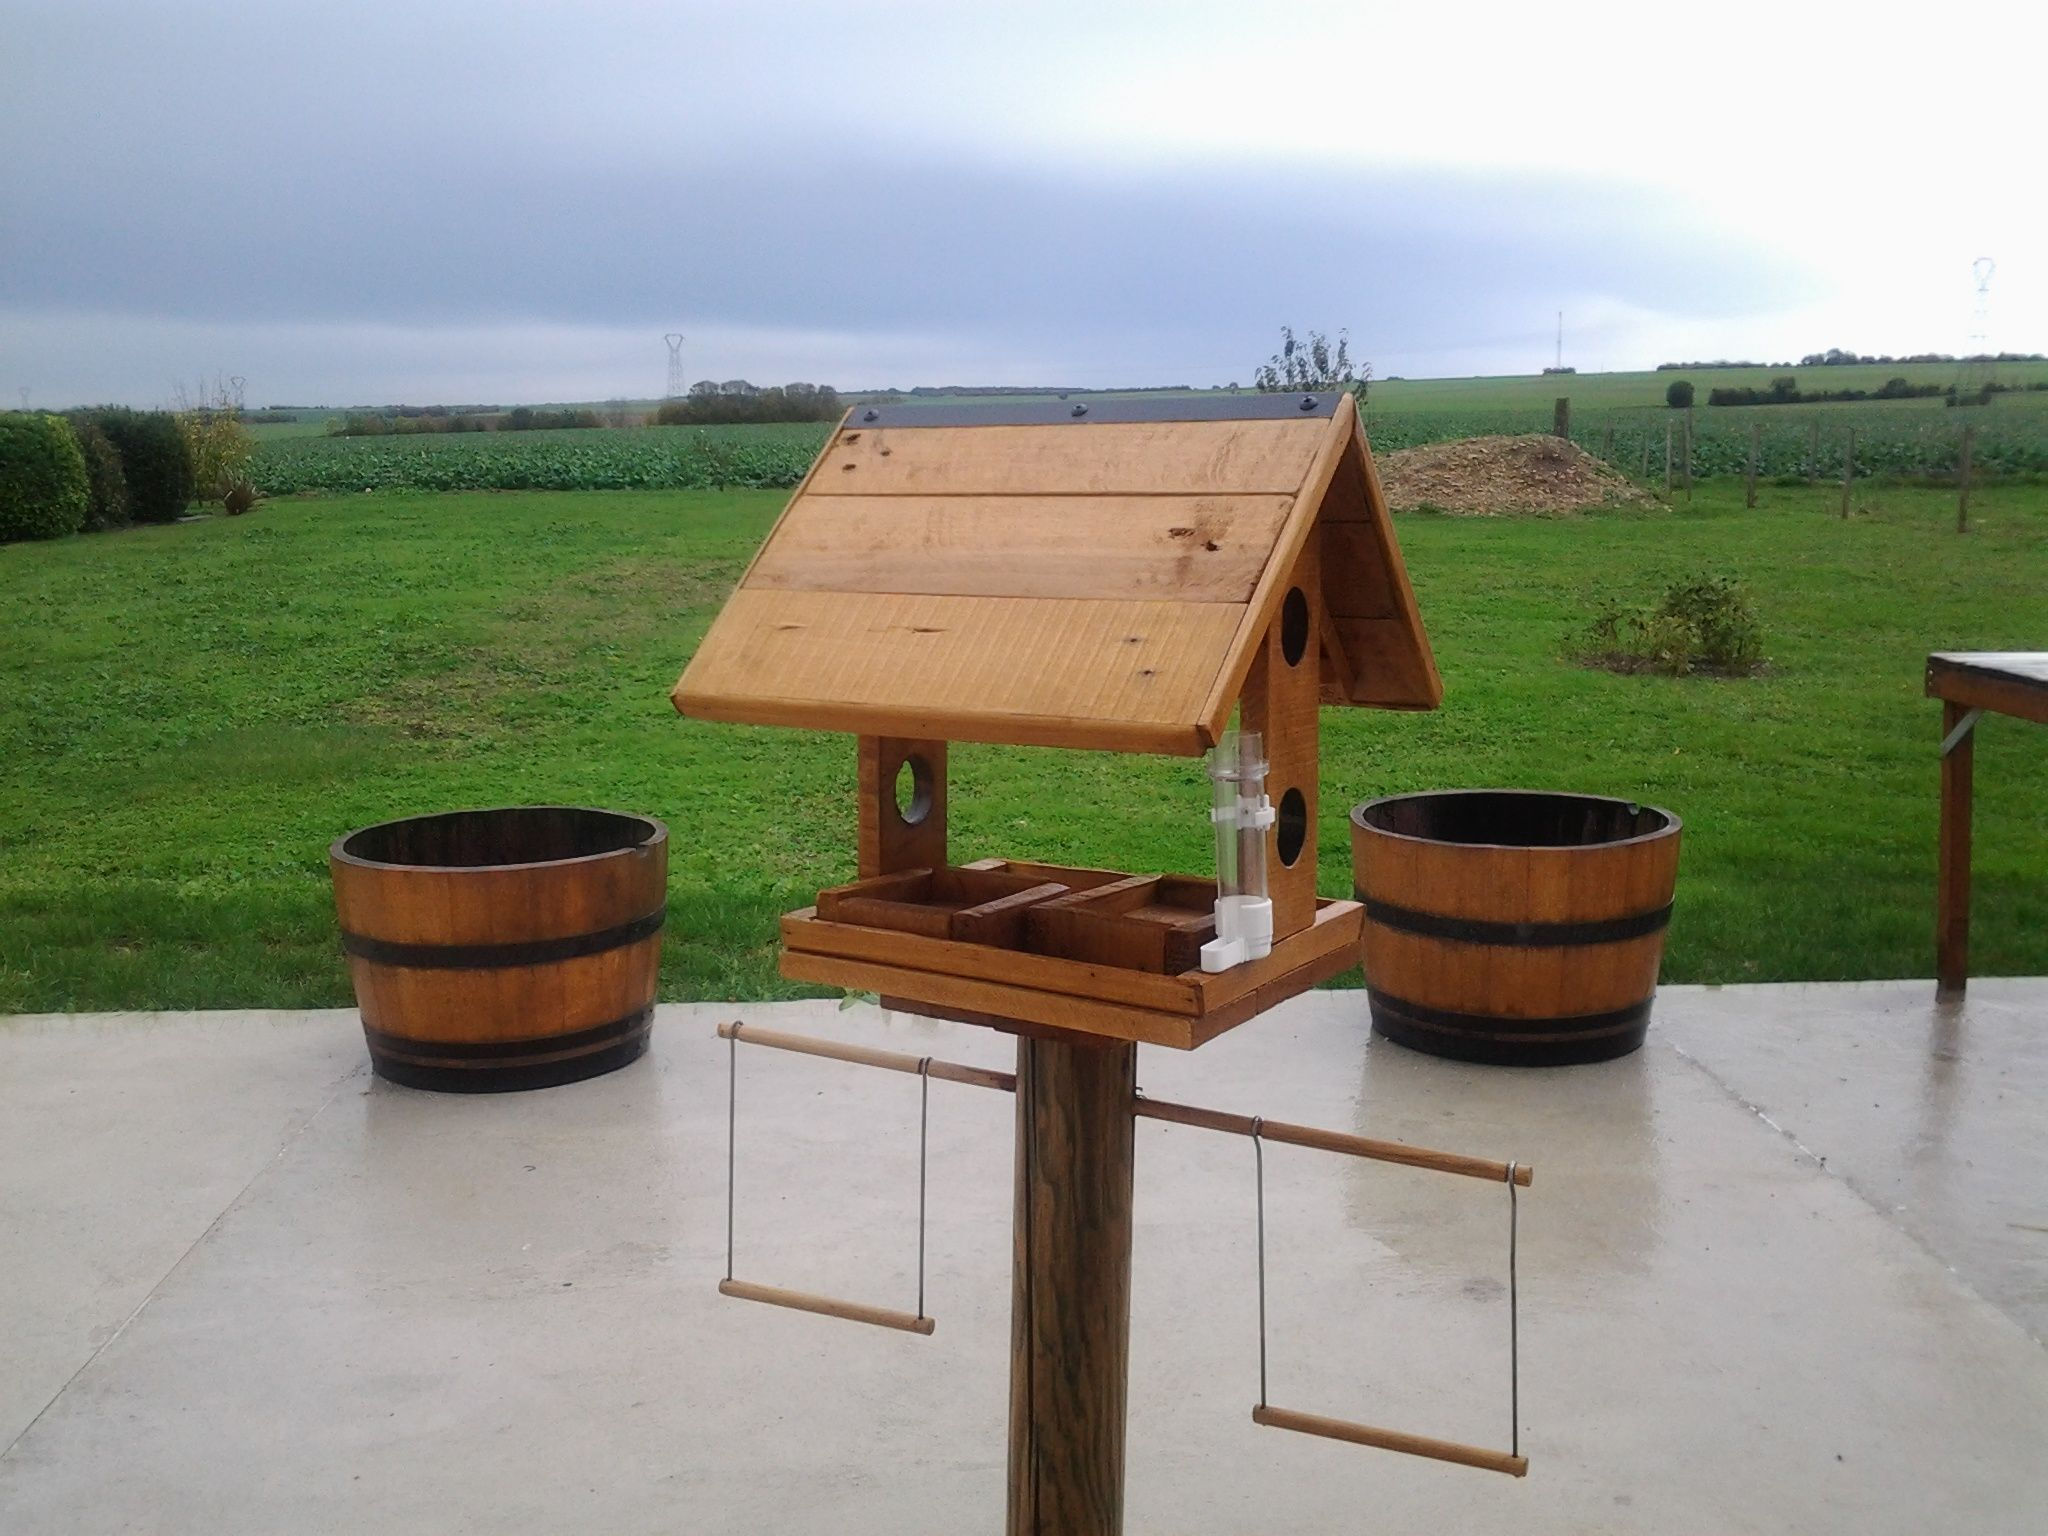 mangeoire pour oiseaux pallet bird feeder maison en. Black Bedroom Furniture Sets. Home Design Ideas